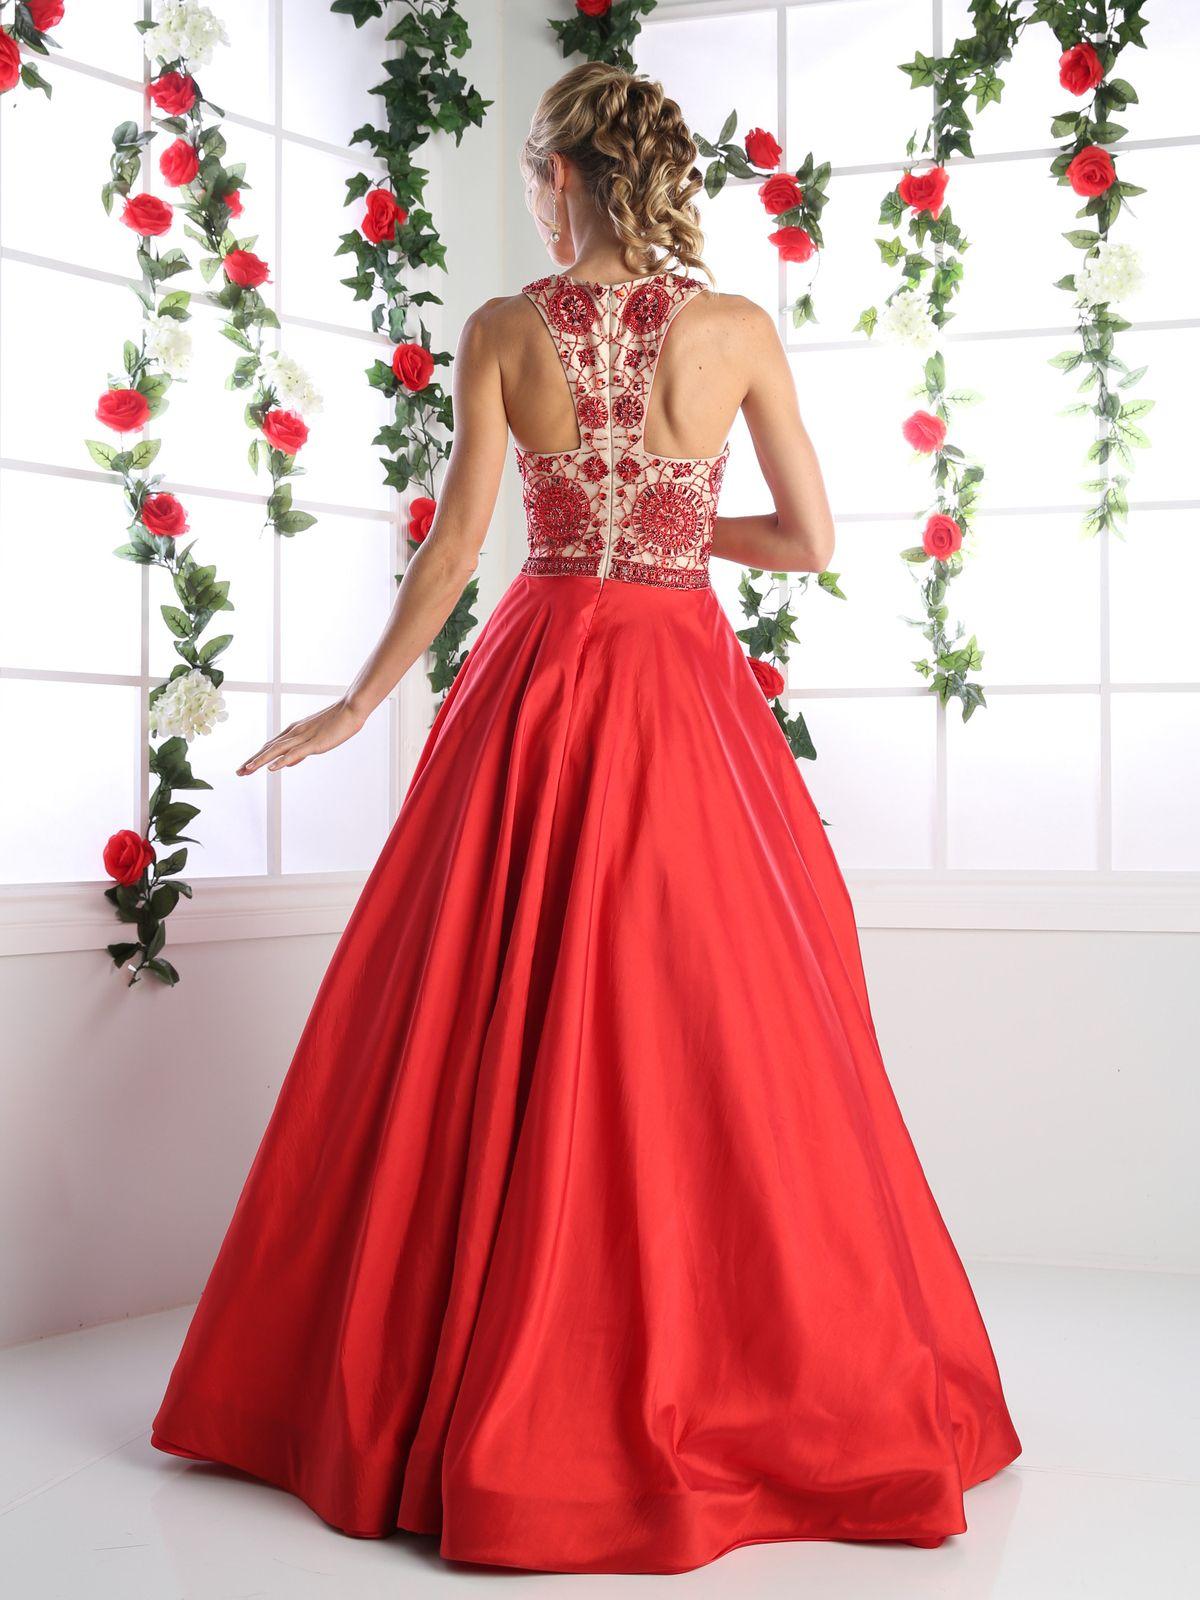 Elegant Prom Gown With Full Skirt Elegant Prom Dresses Prom Gown Dresses [ 1600 x 1200 Pixel ]